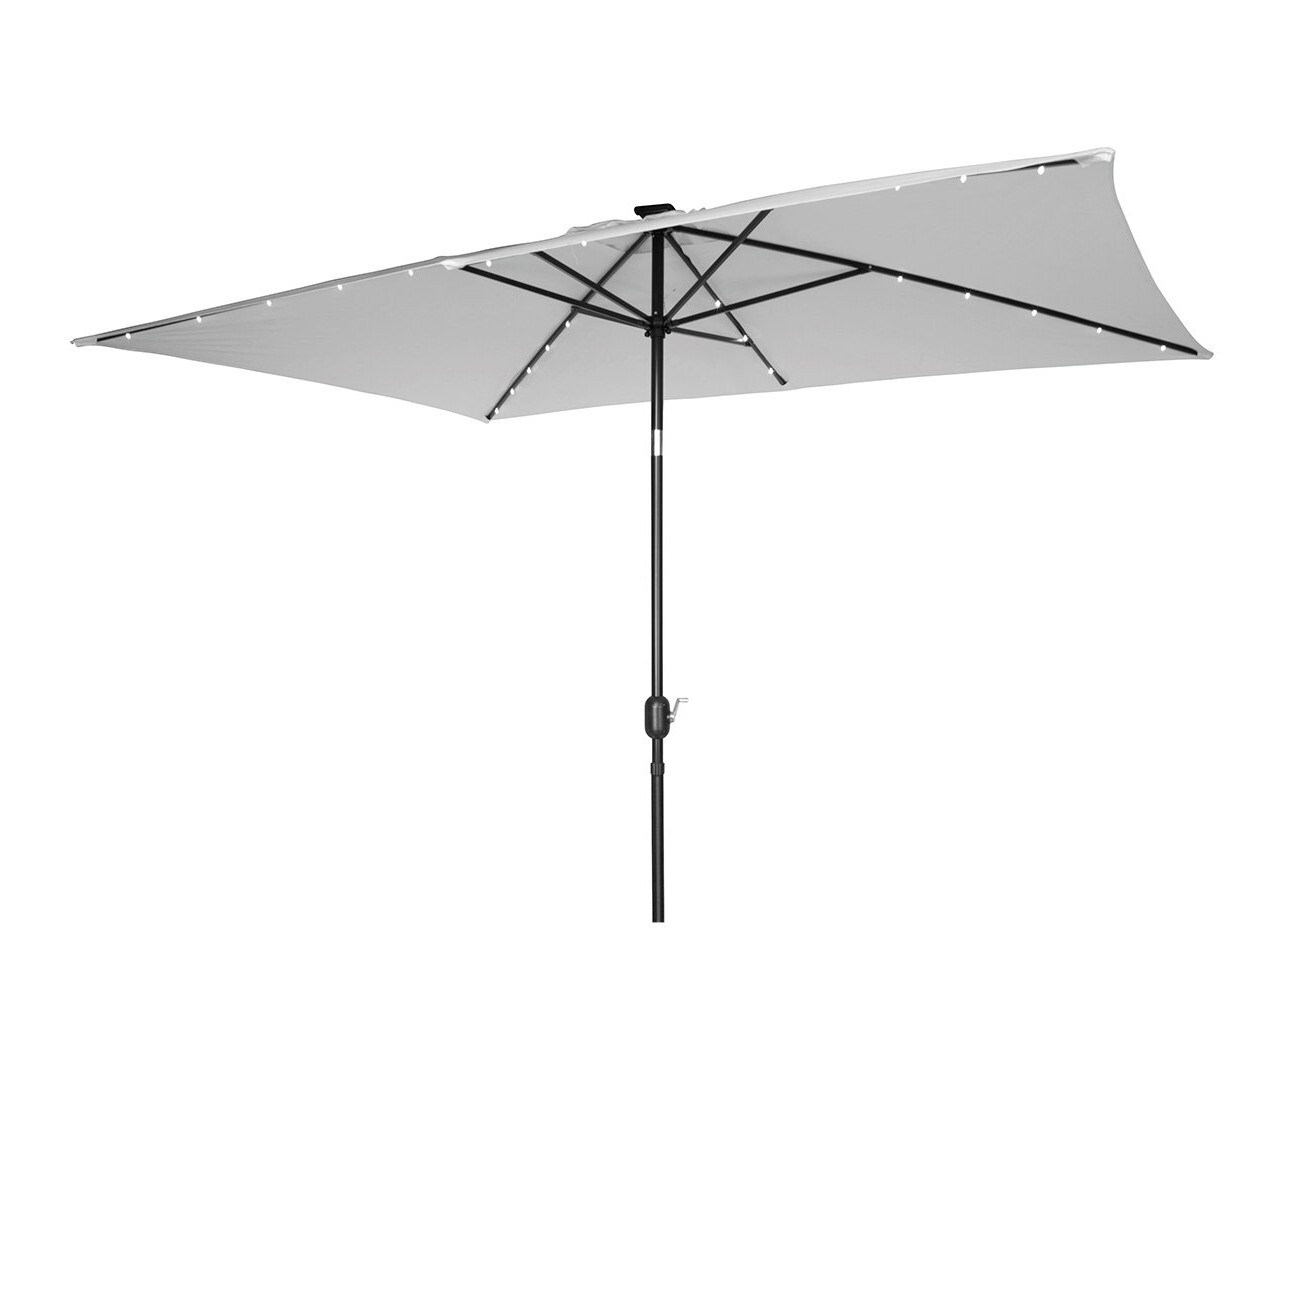 Bangert 10' X 6.5' Rectangular Lighted Umbrella For 2020 Dena Rectangular Market Umbrellas (Gallery 18 of 20)